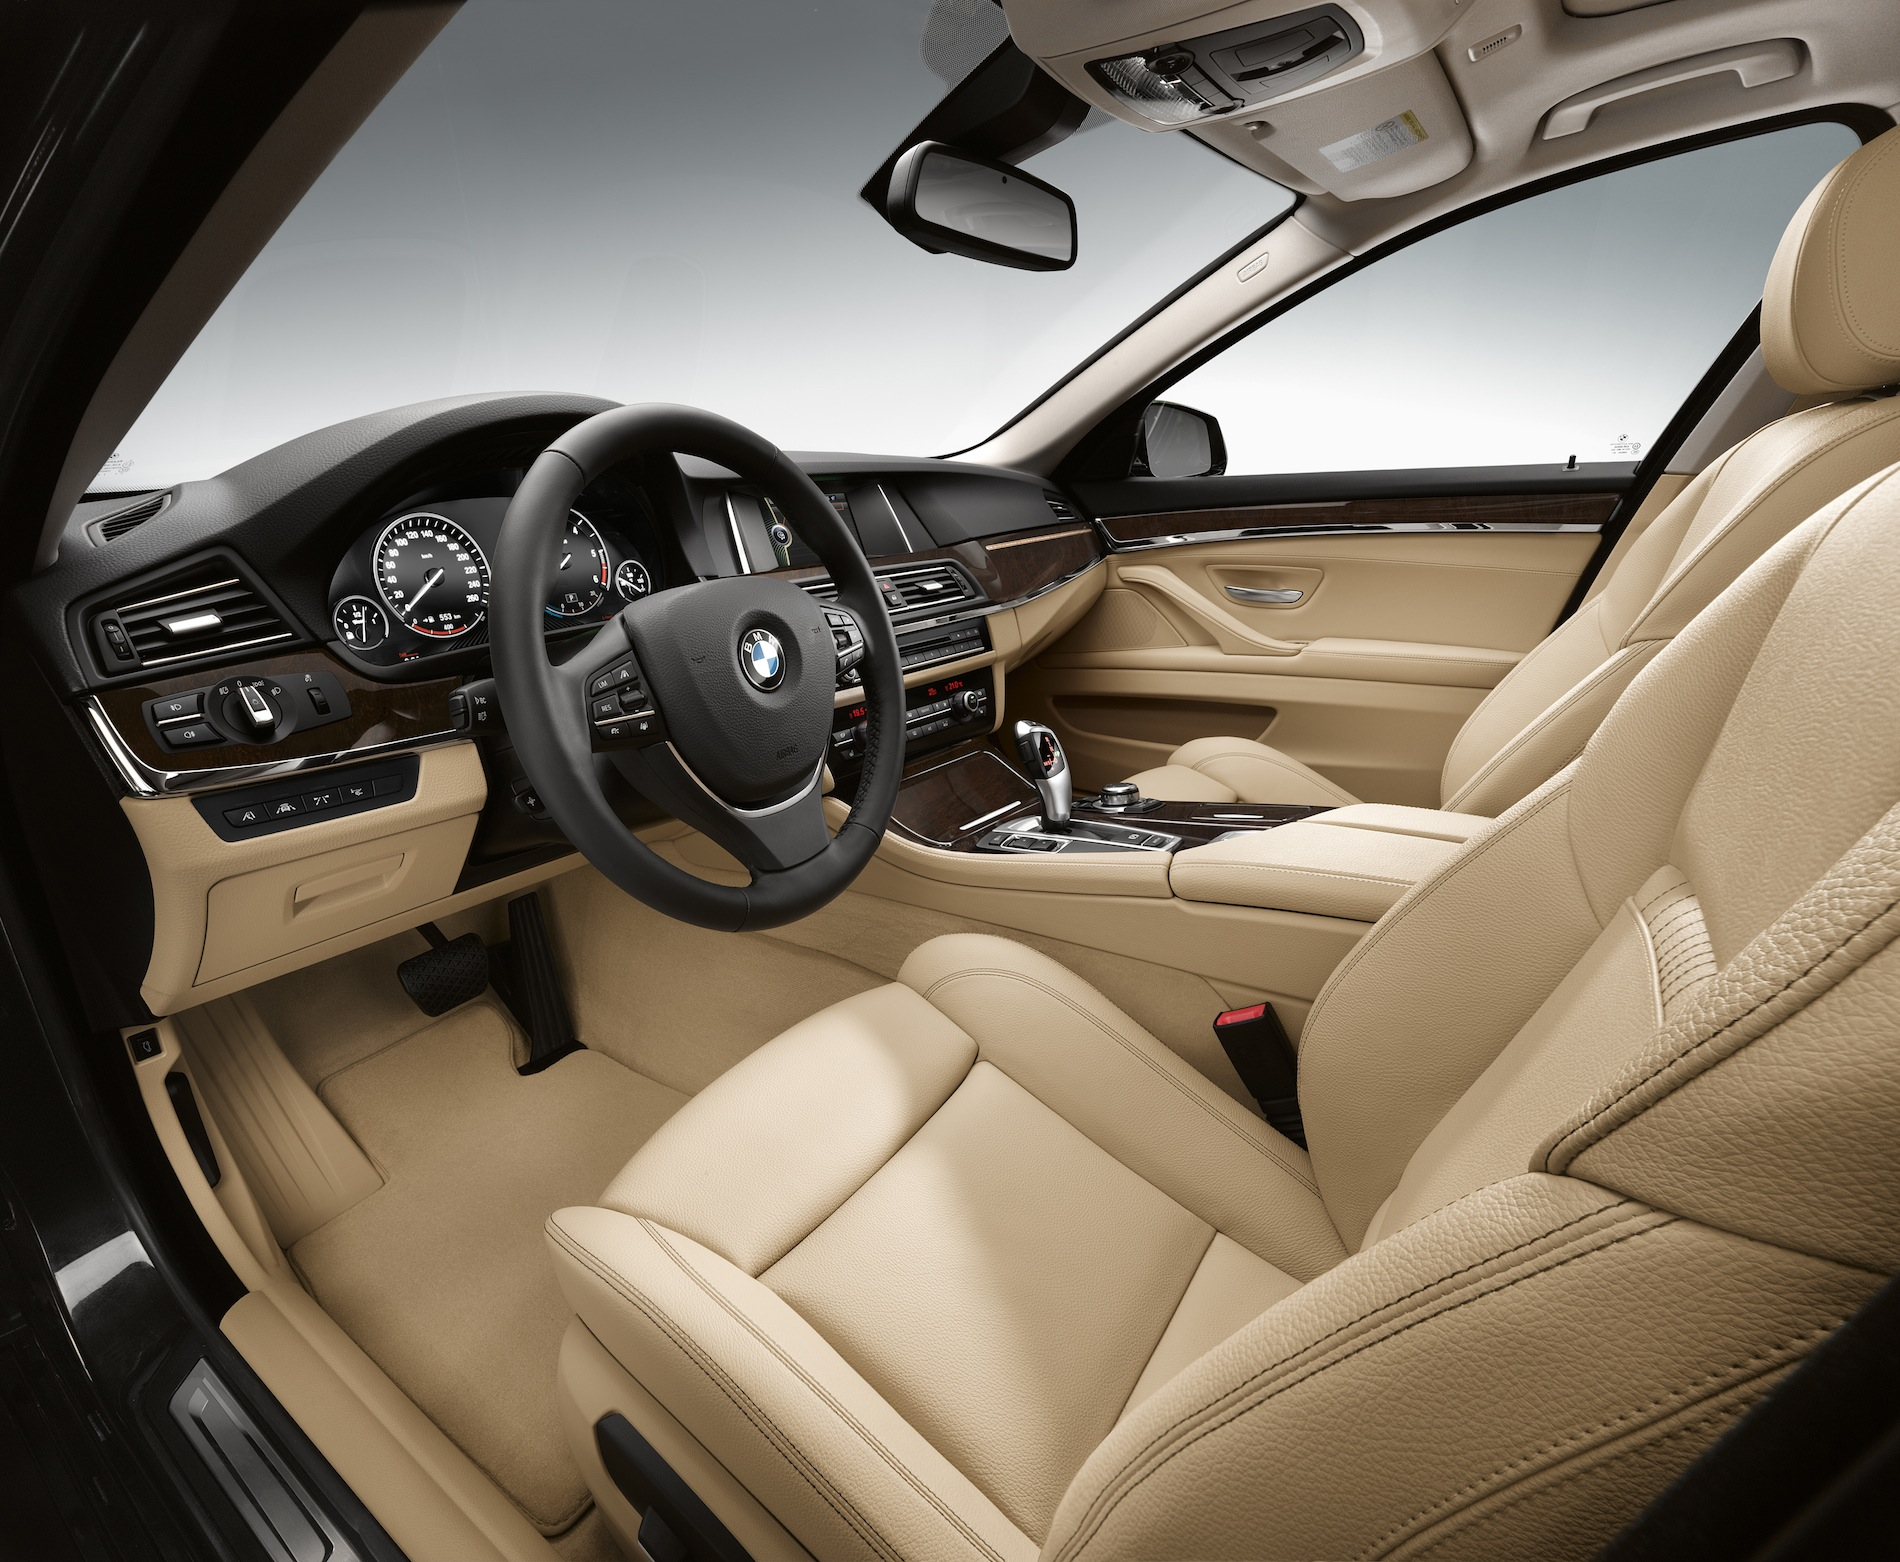 F10 BMW interior